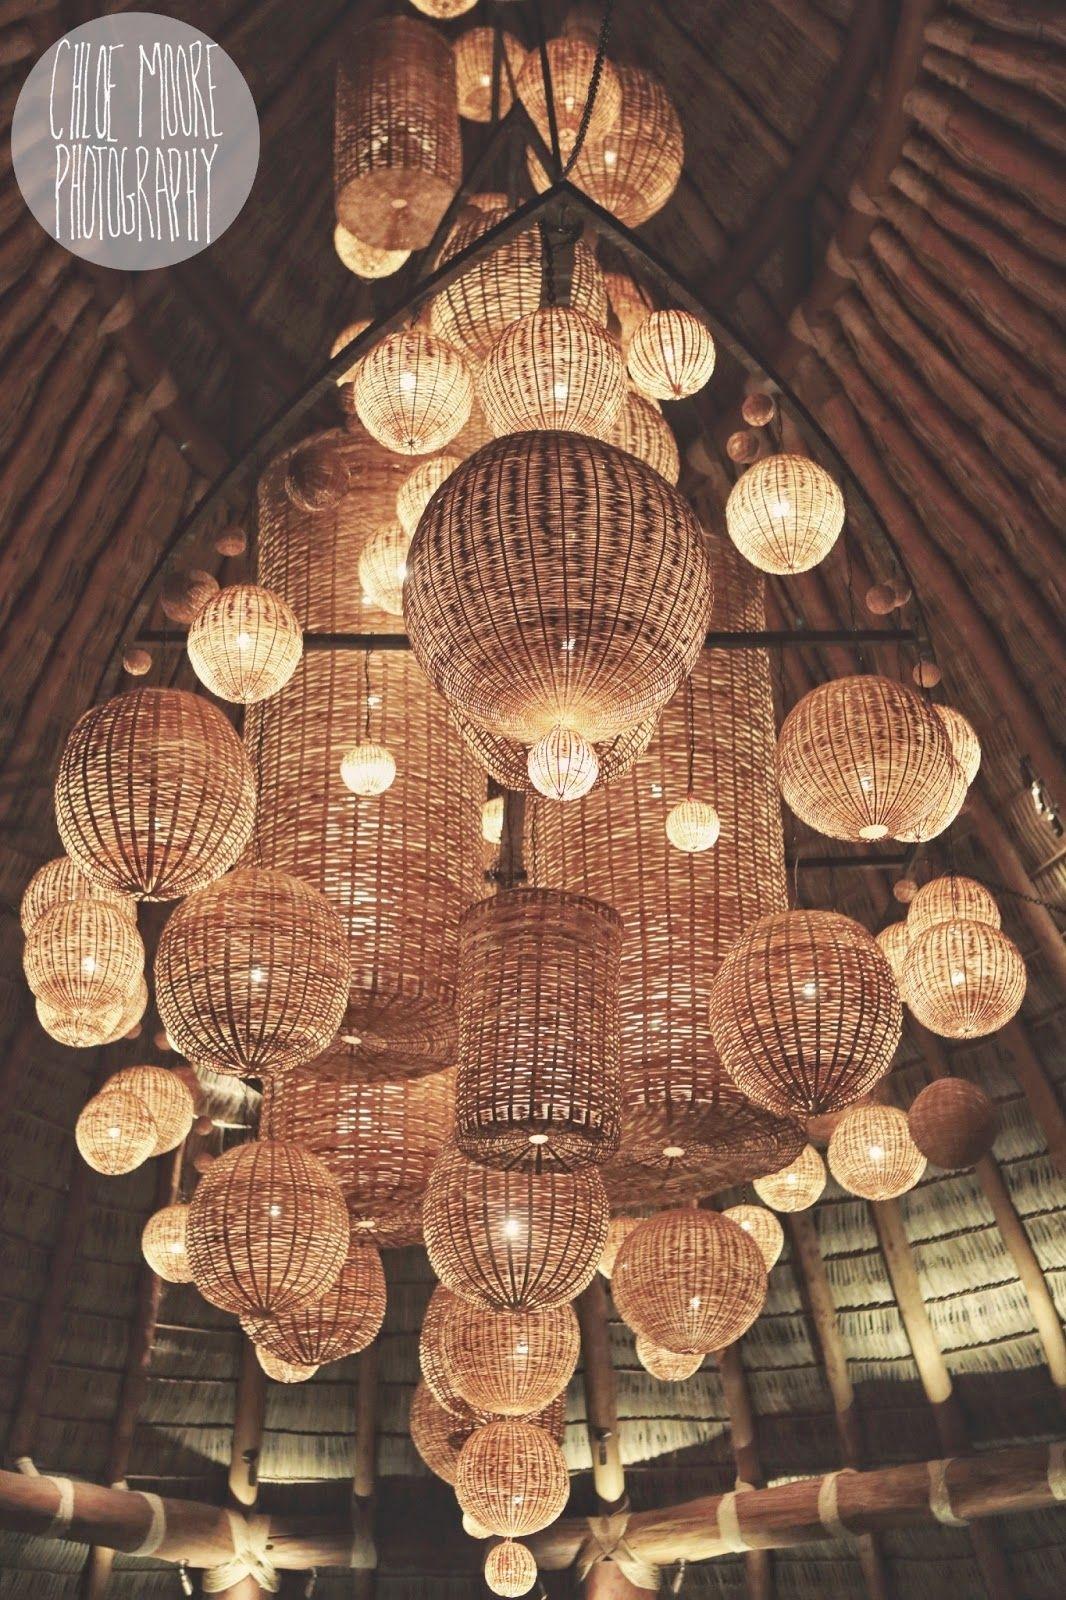 Awesome Wicker Basket Lighting Mukul Resort, Nicaragua (View 6 of 15)